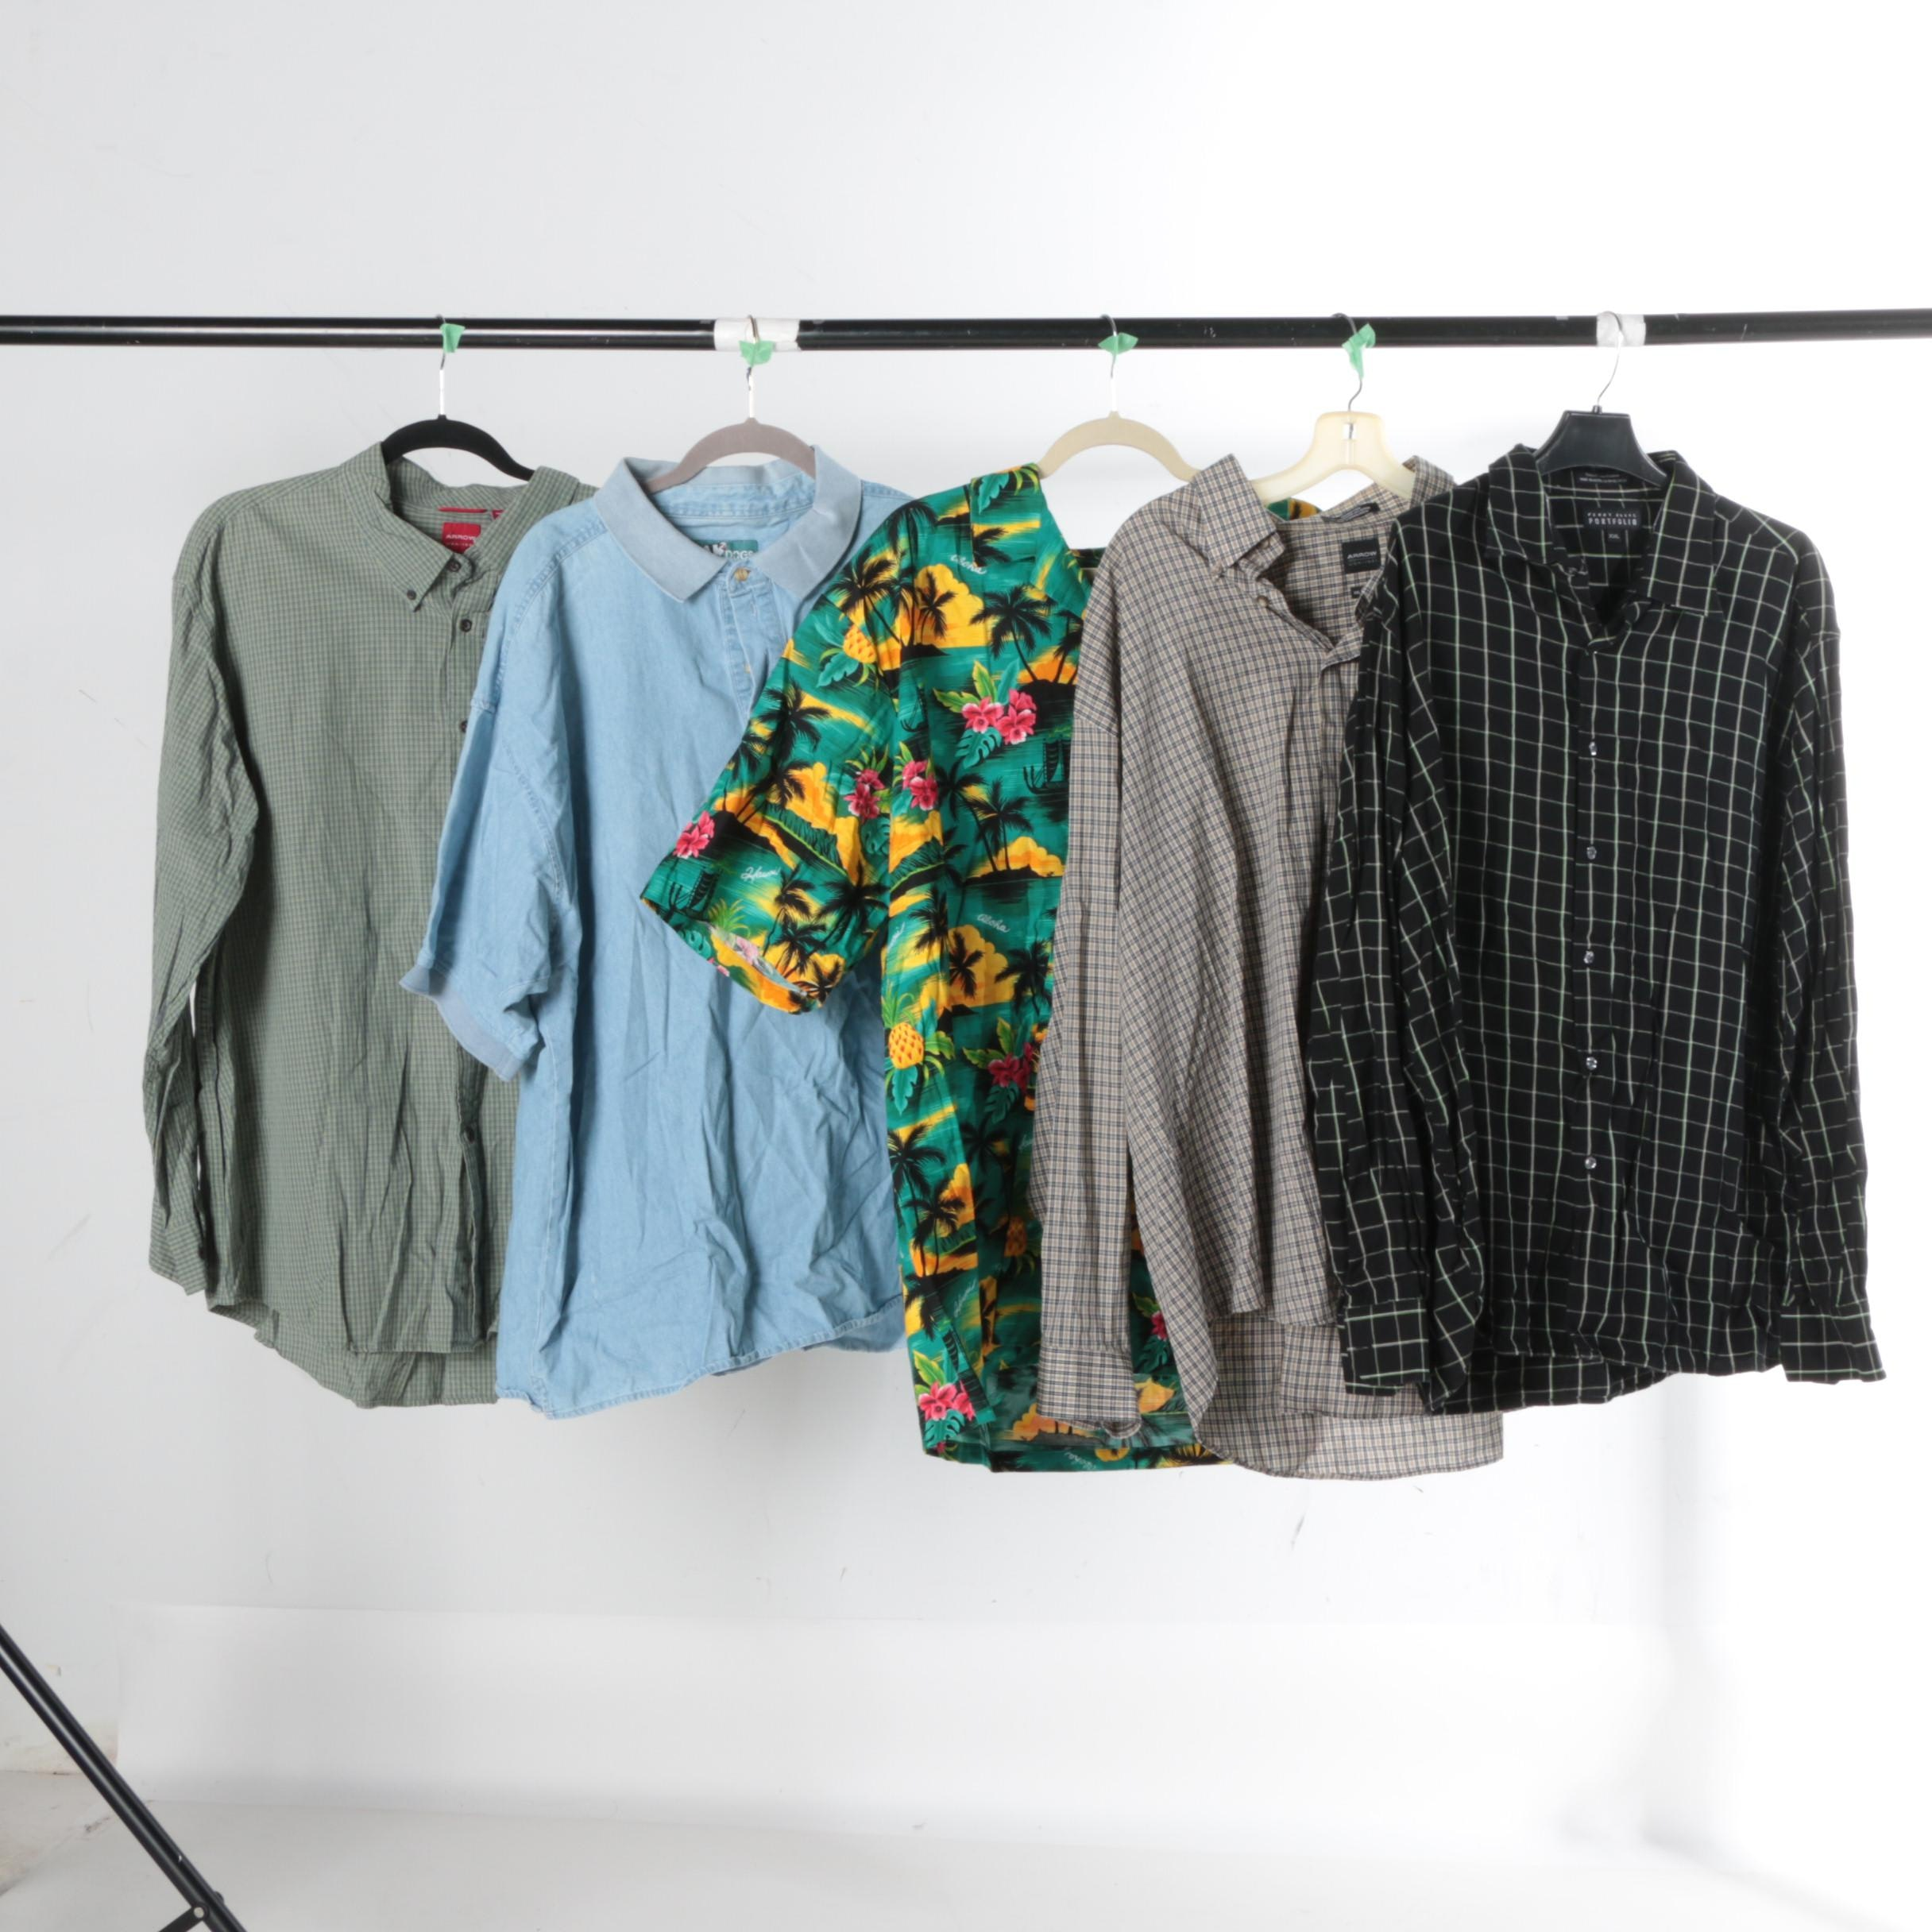 Men's Button-Down Shirts Including Arrow